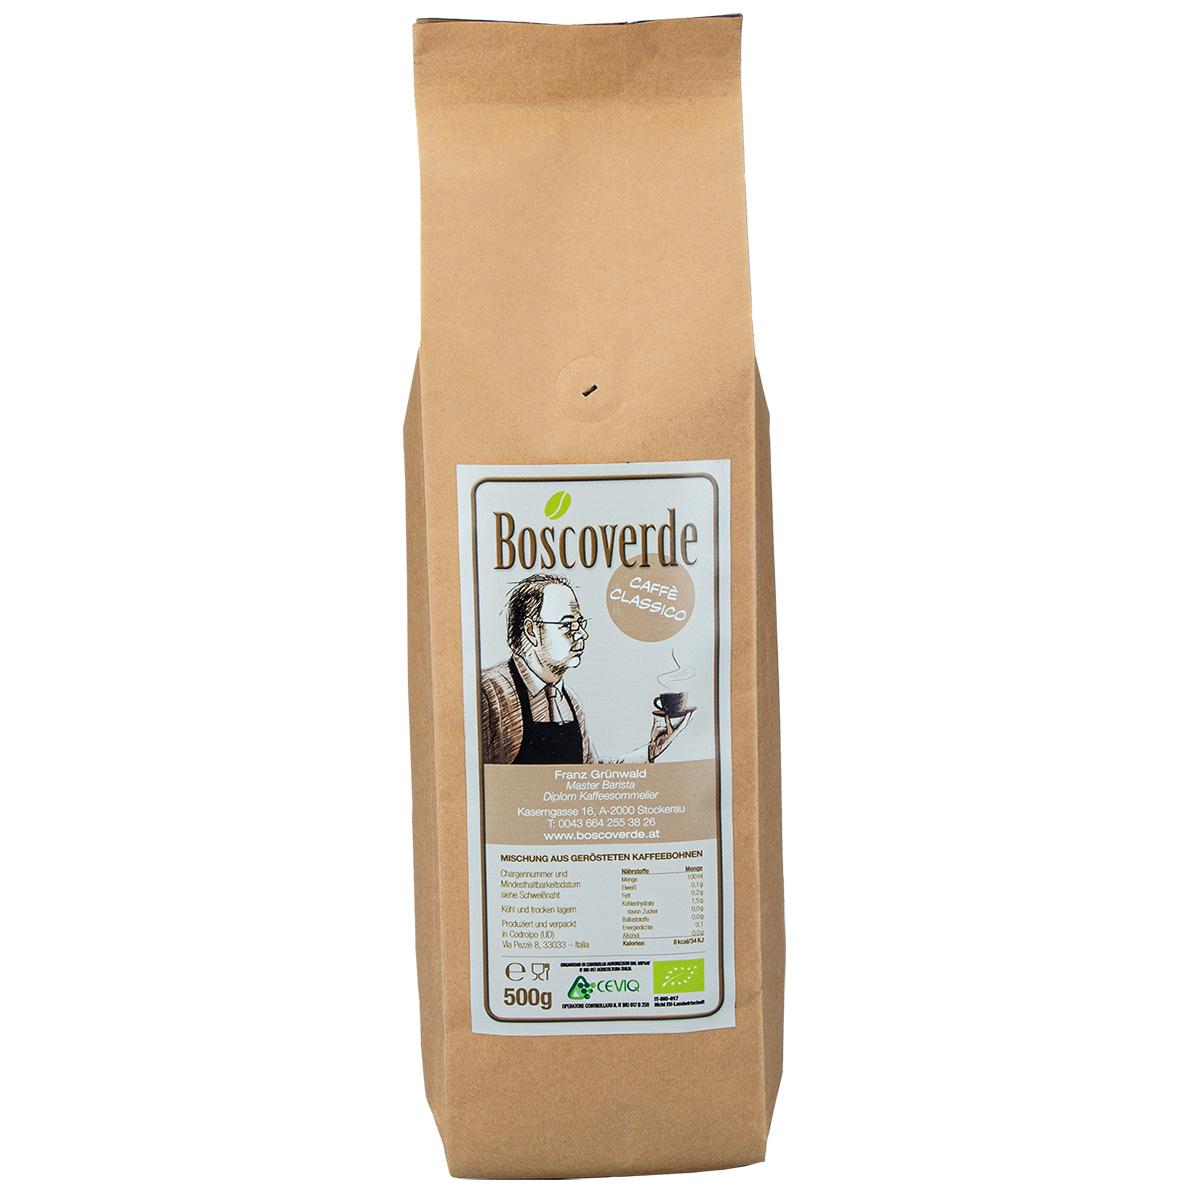 Boscoverde Bio Caffe Classico